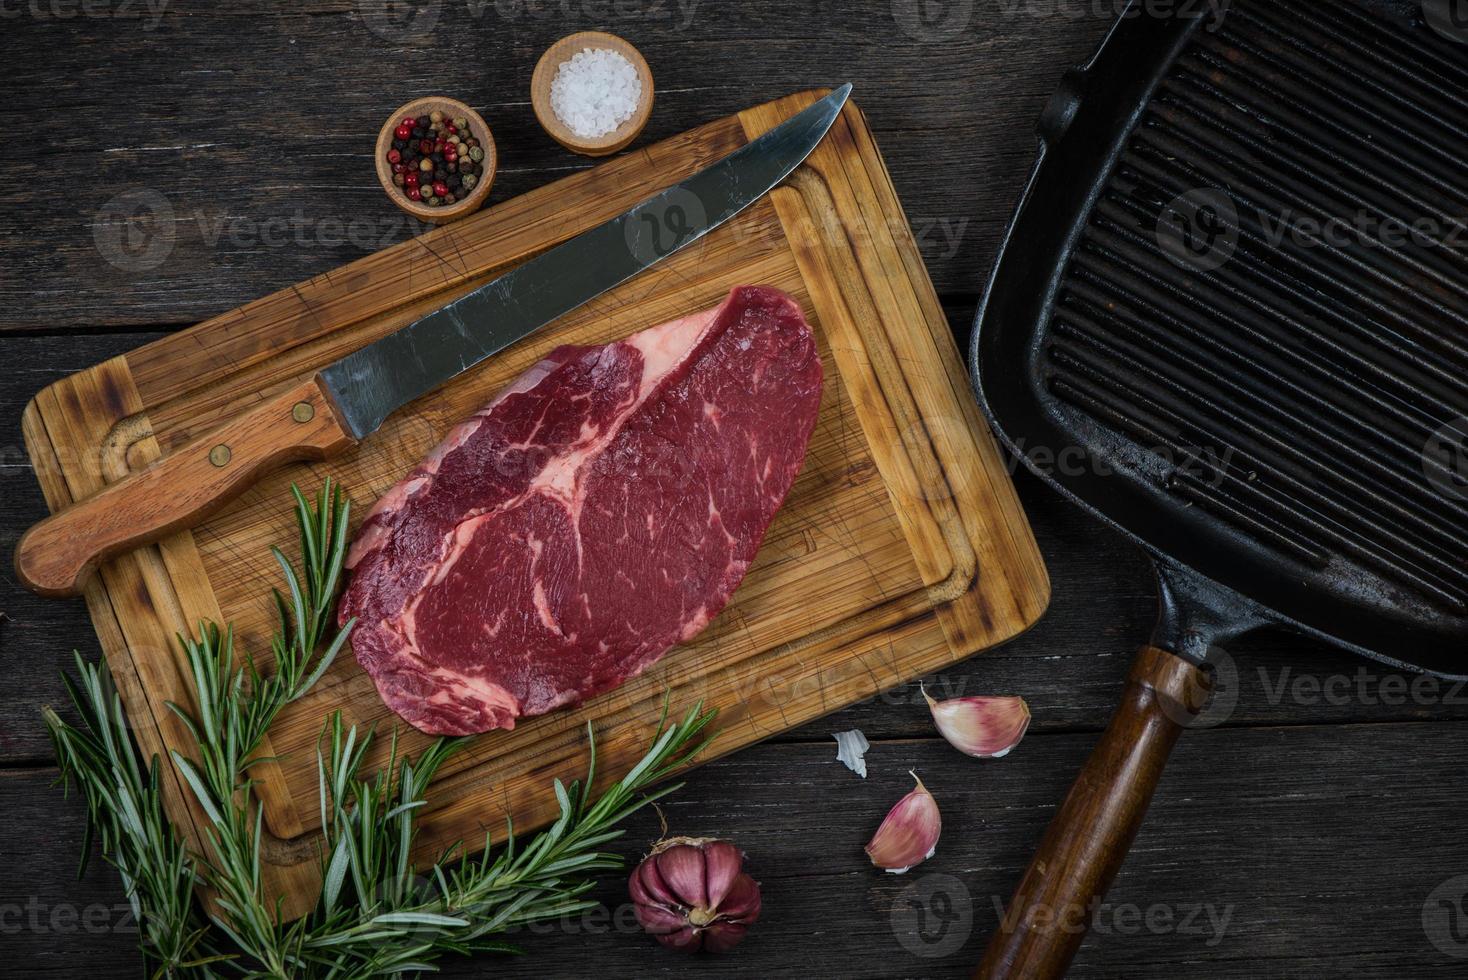 rauwe ribeye biefstuk met kruiden en specerijen van bovenaf foto